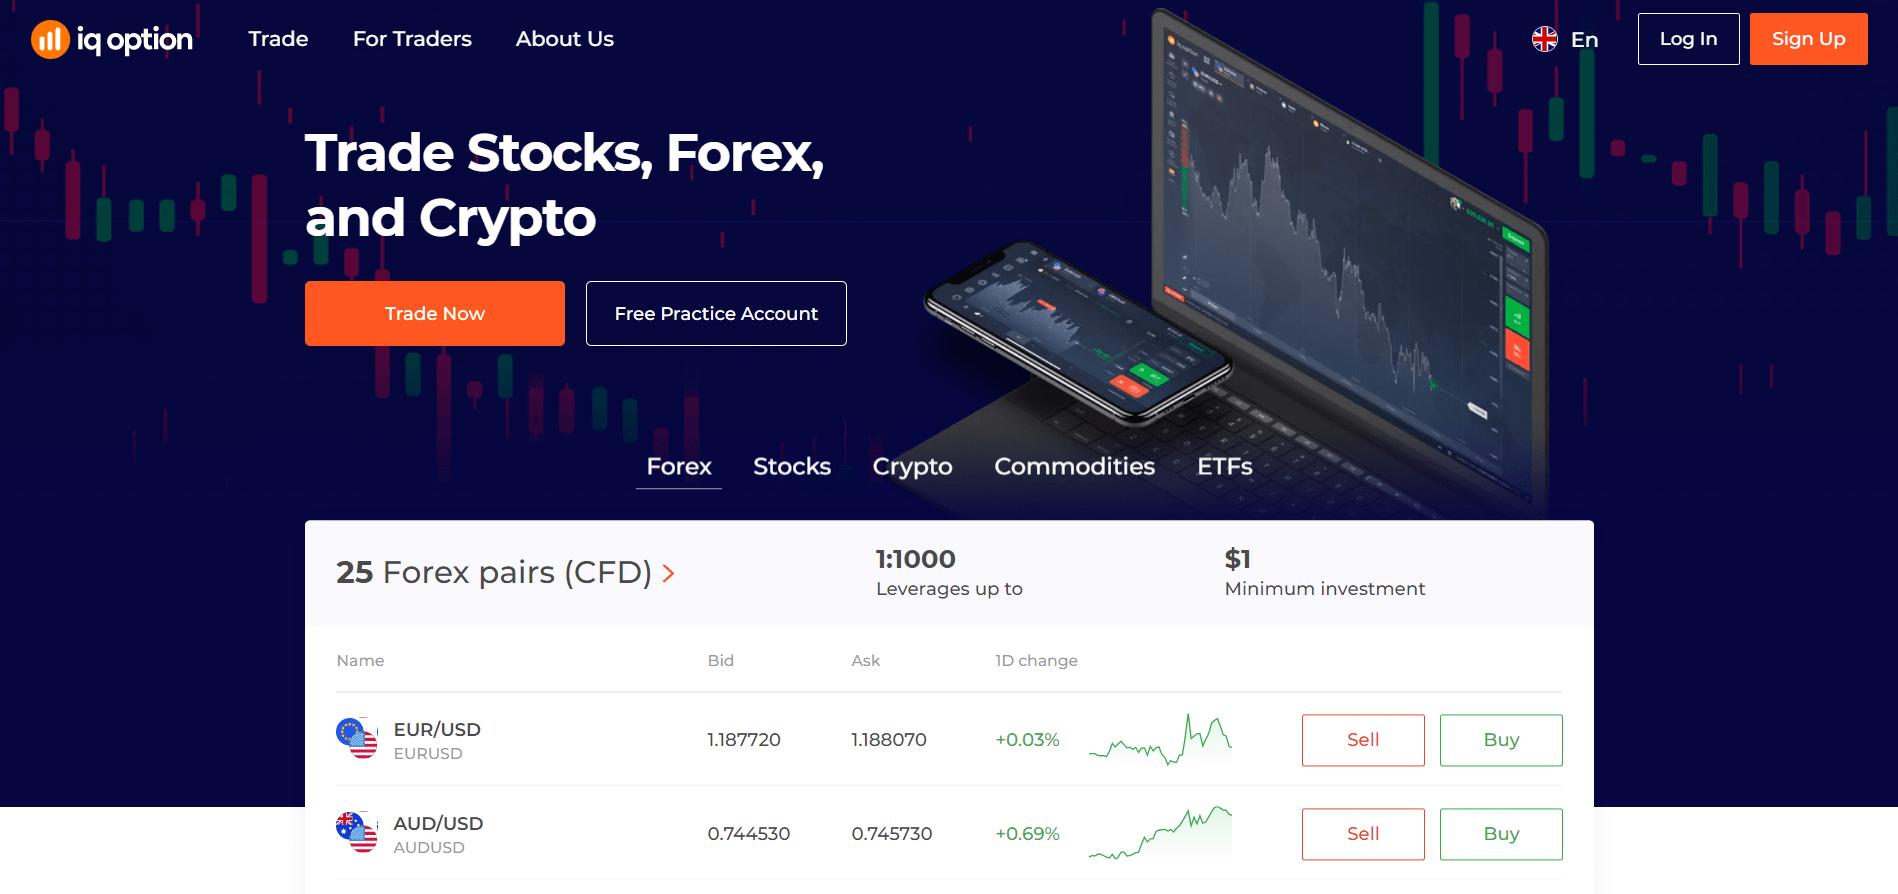 IQ Option official website